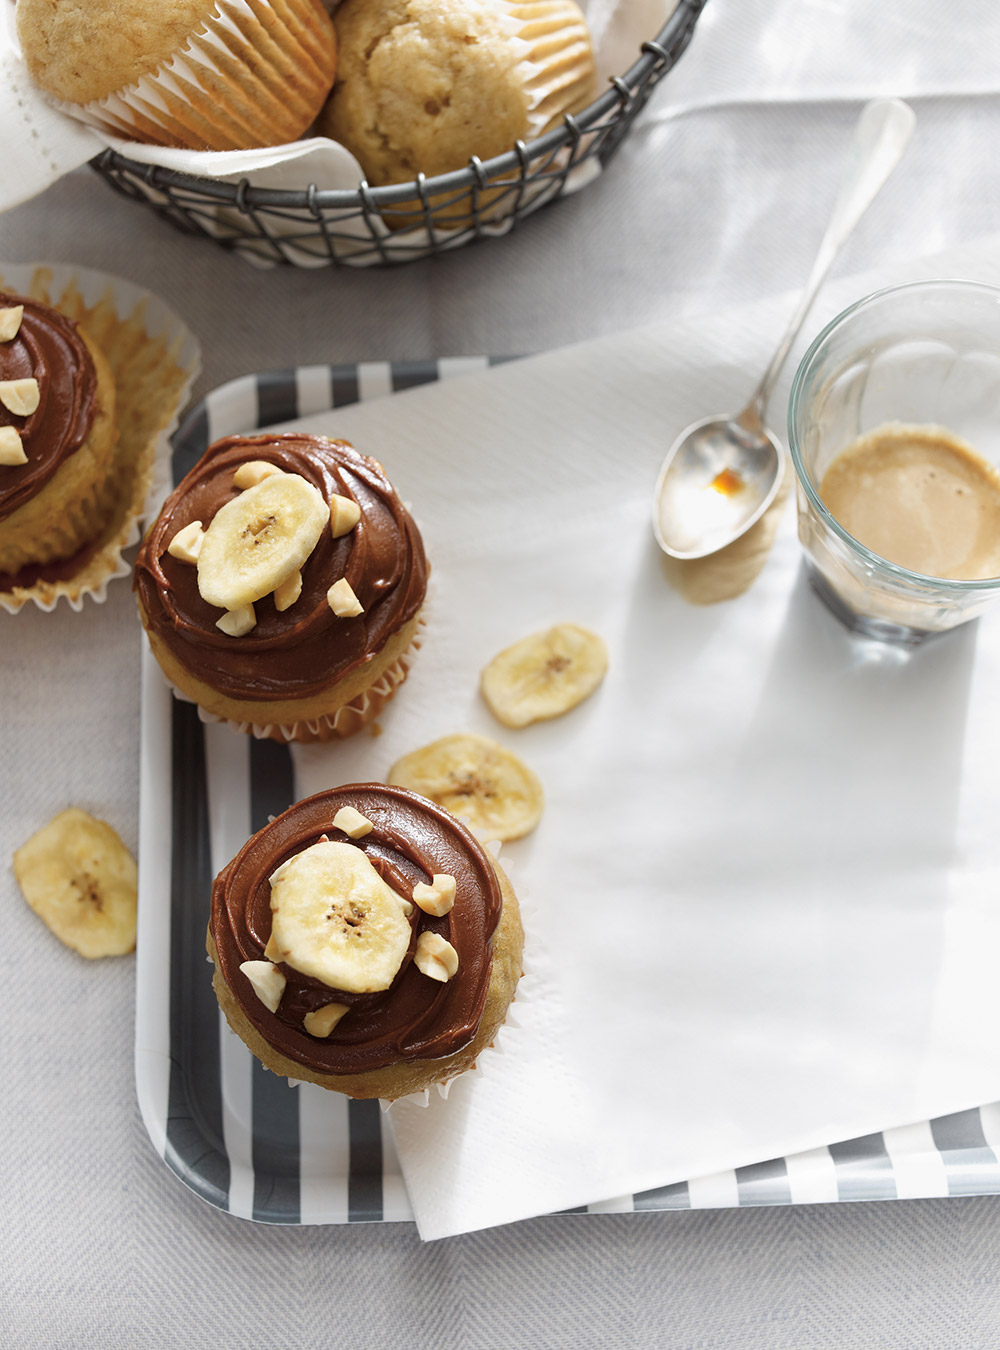 Muffins aux bananes, glaçage choco-arachide | ricardo